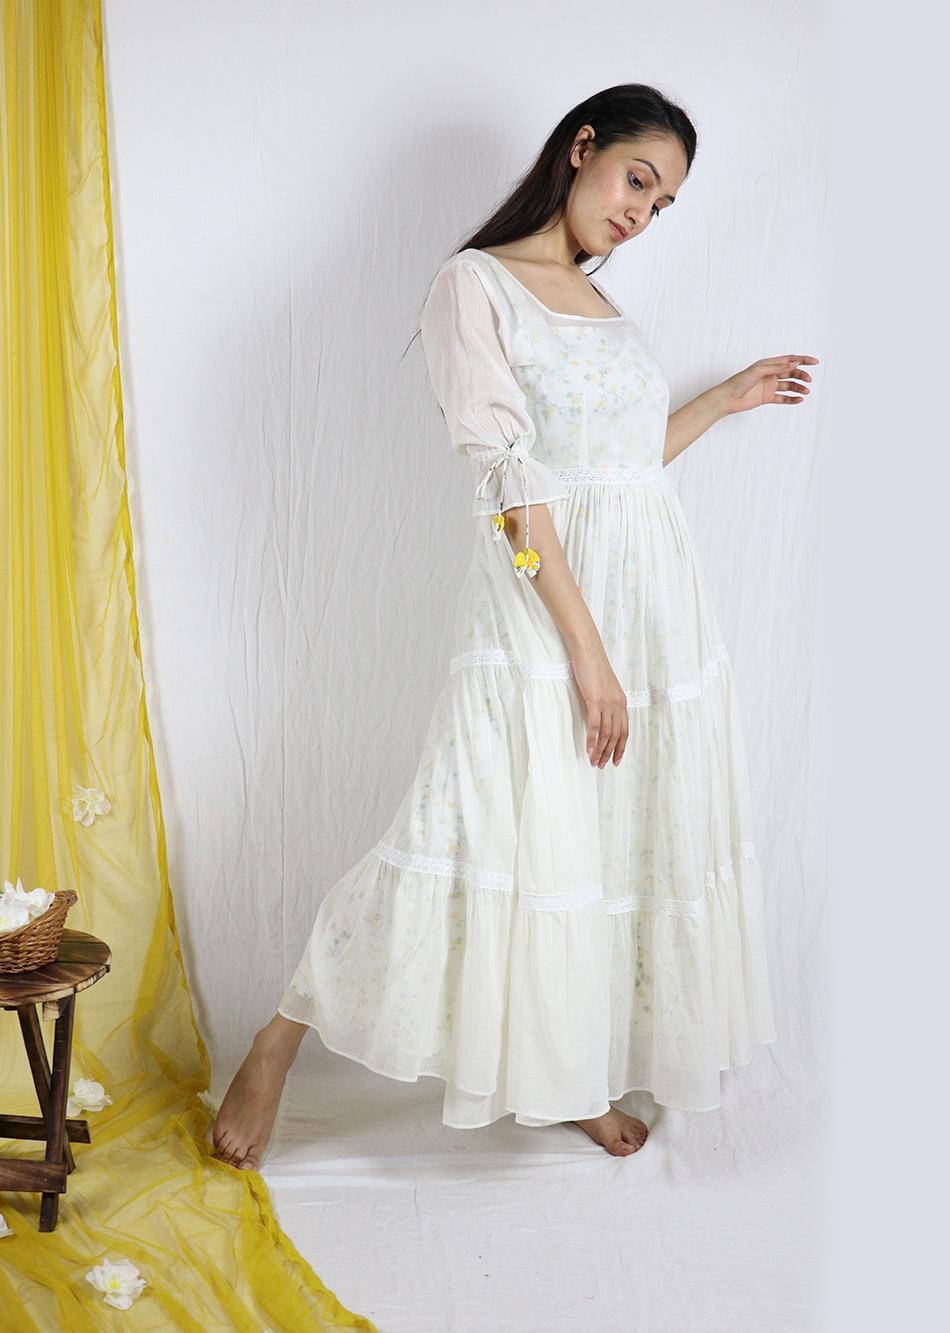 Basantah tiered dress (with printed inner) By Jovi Fashion